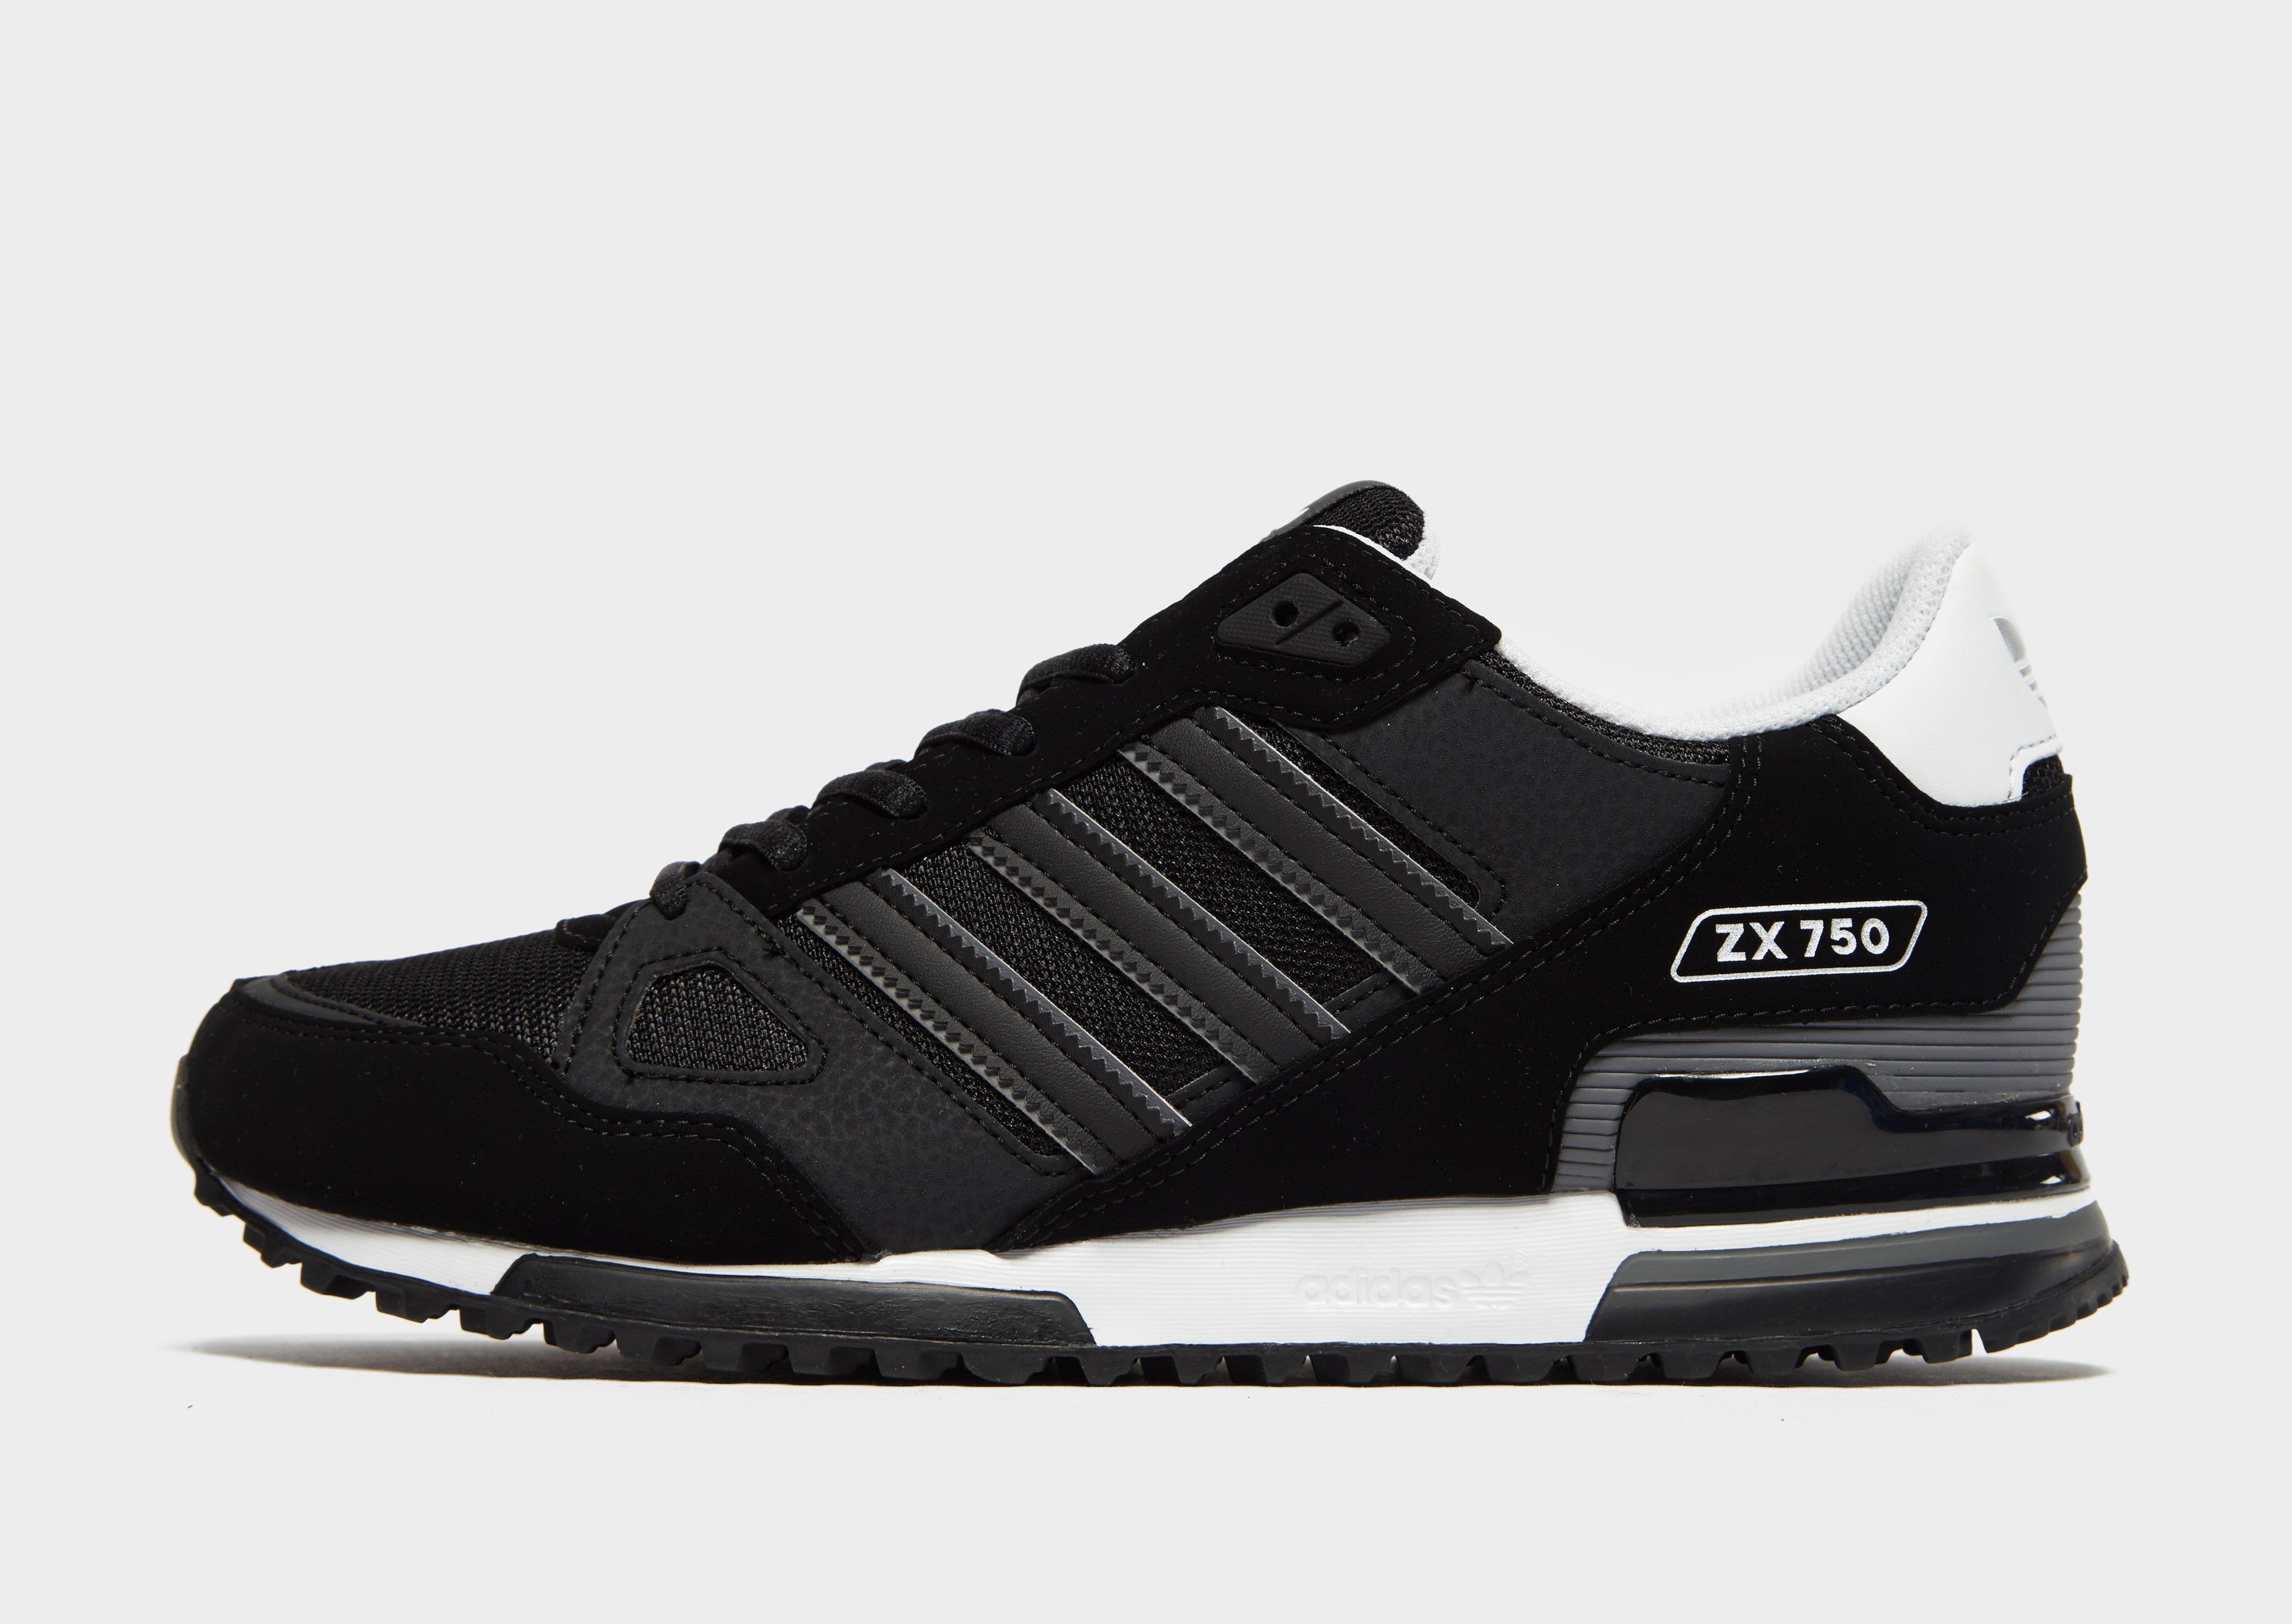 adidas zx 750 noir et blanc